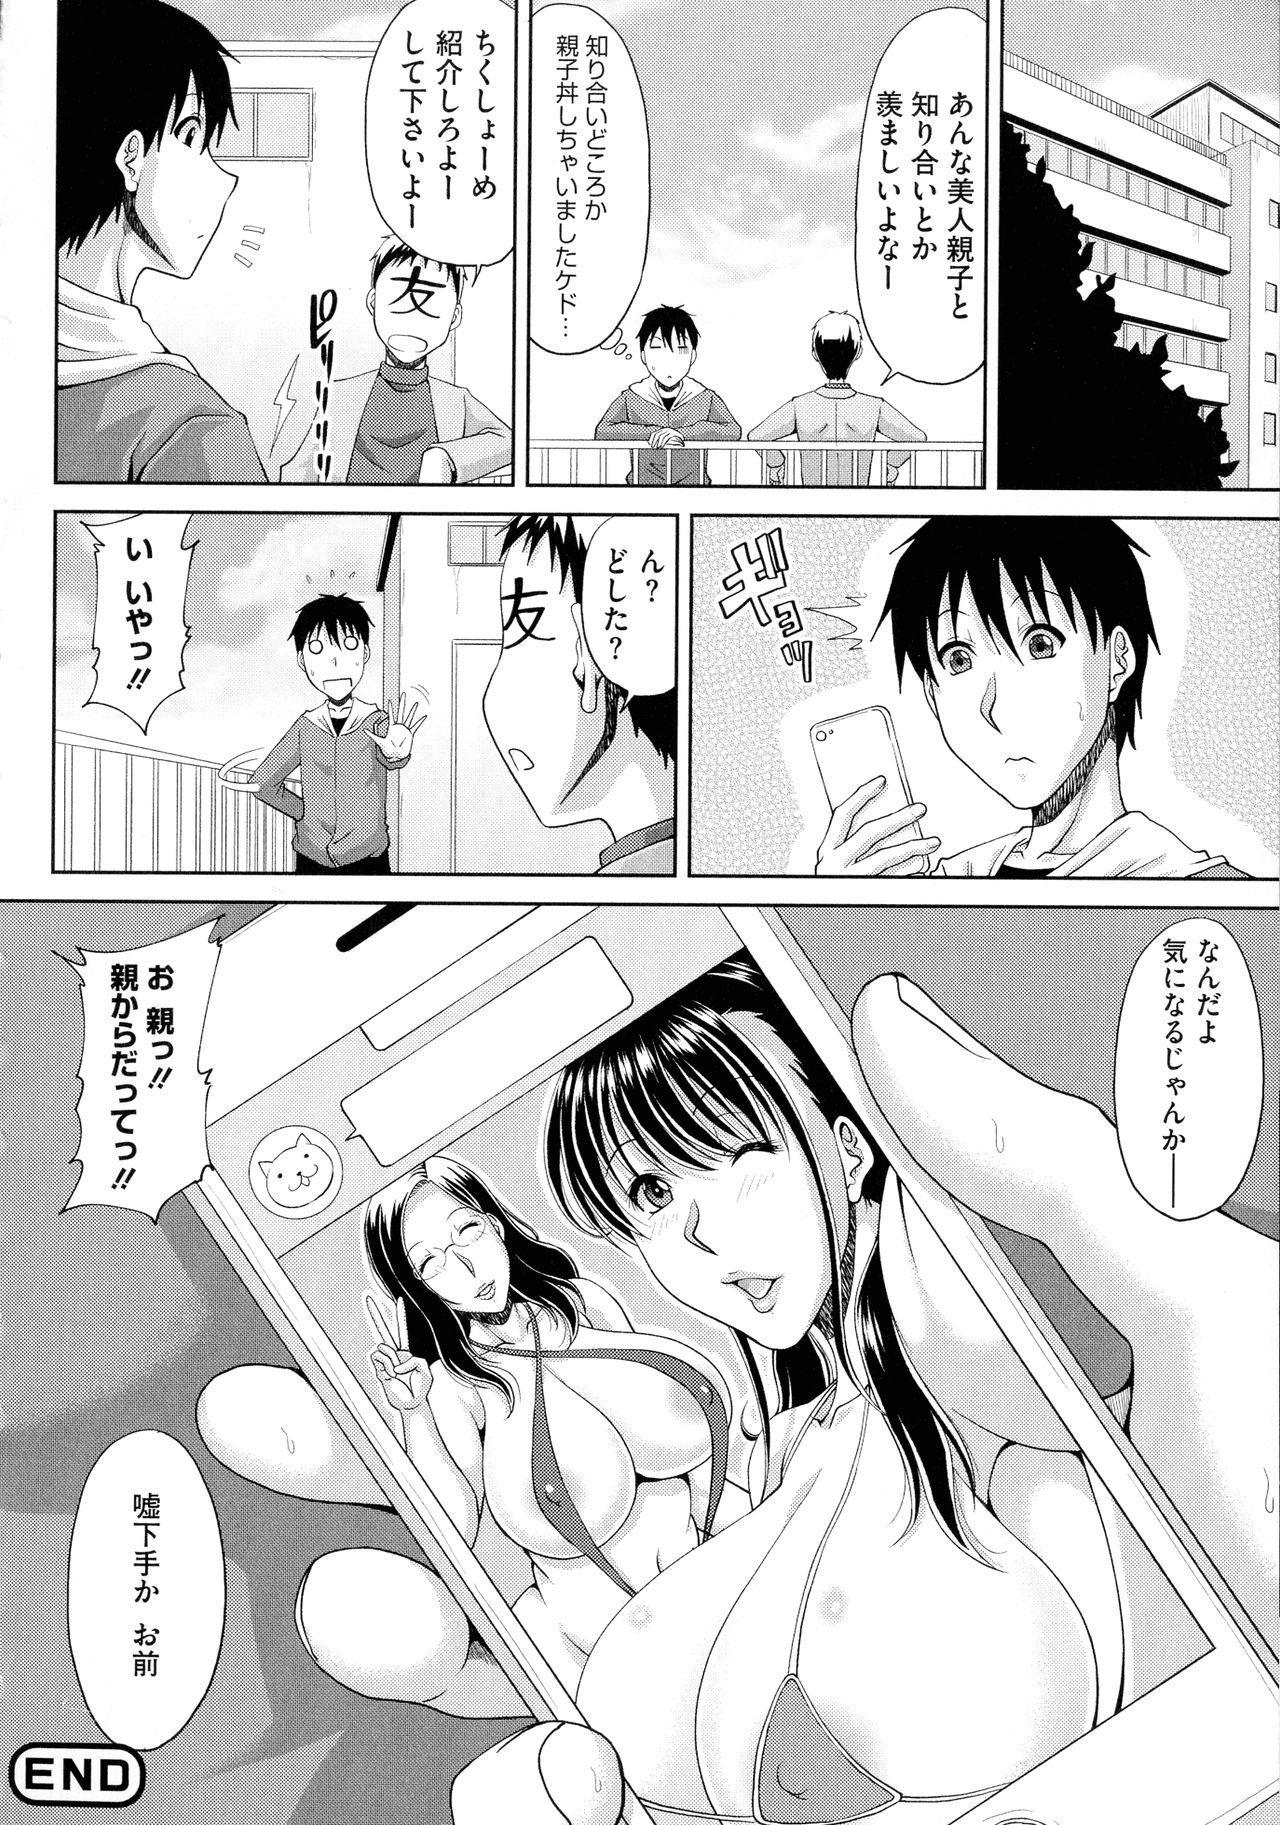 Haramase! 93